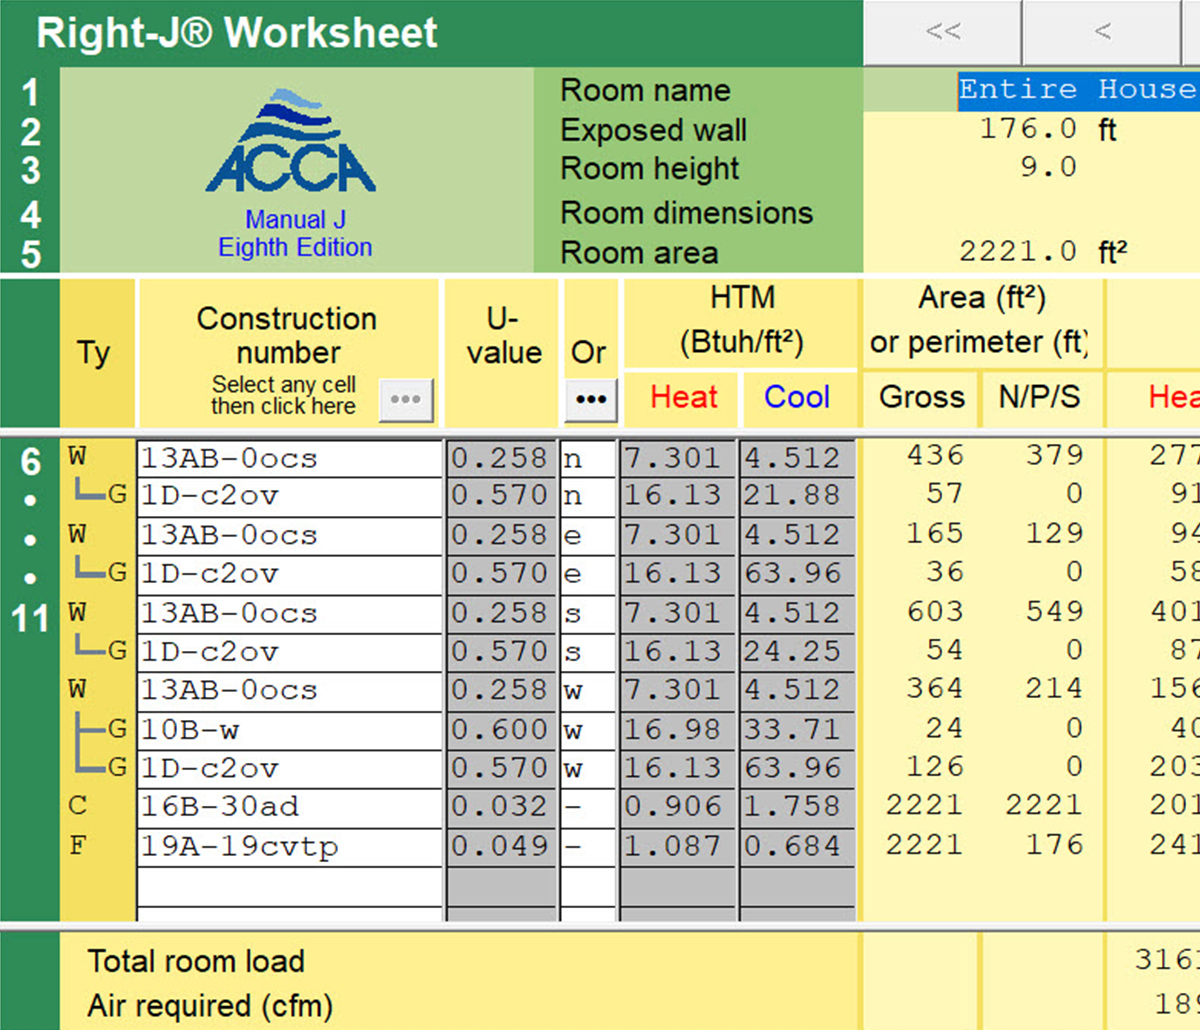 MiTek Wrightsoft Load Calculation Software - Screenshot of Wrightsoft load calculation software